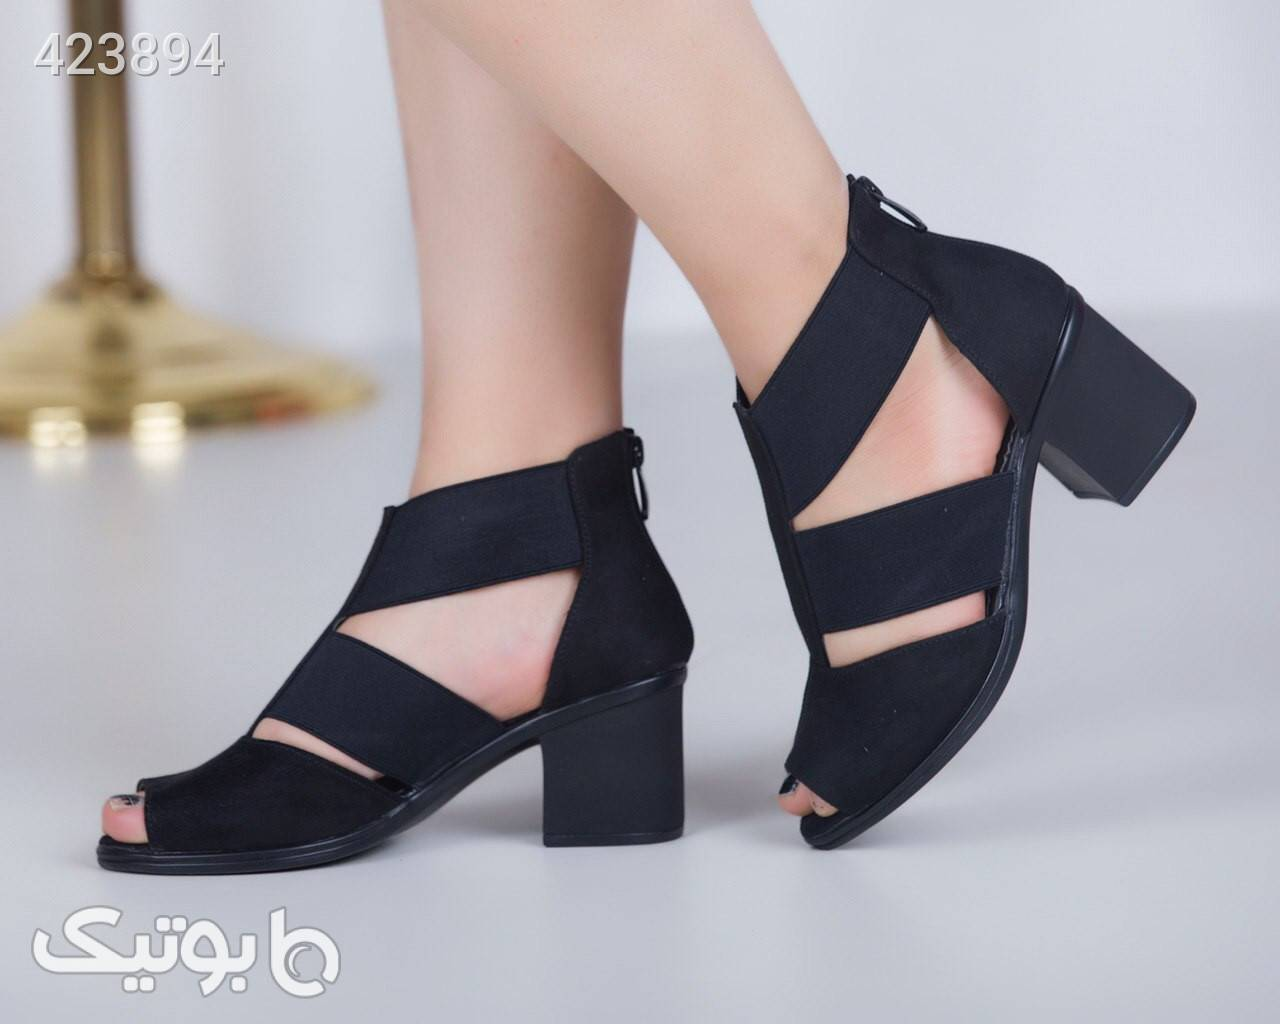 کفش مجلسی پاشنه۷سانت شیک ولاکچری مشکی كفش زنانه